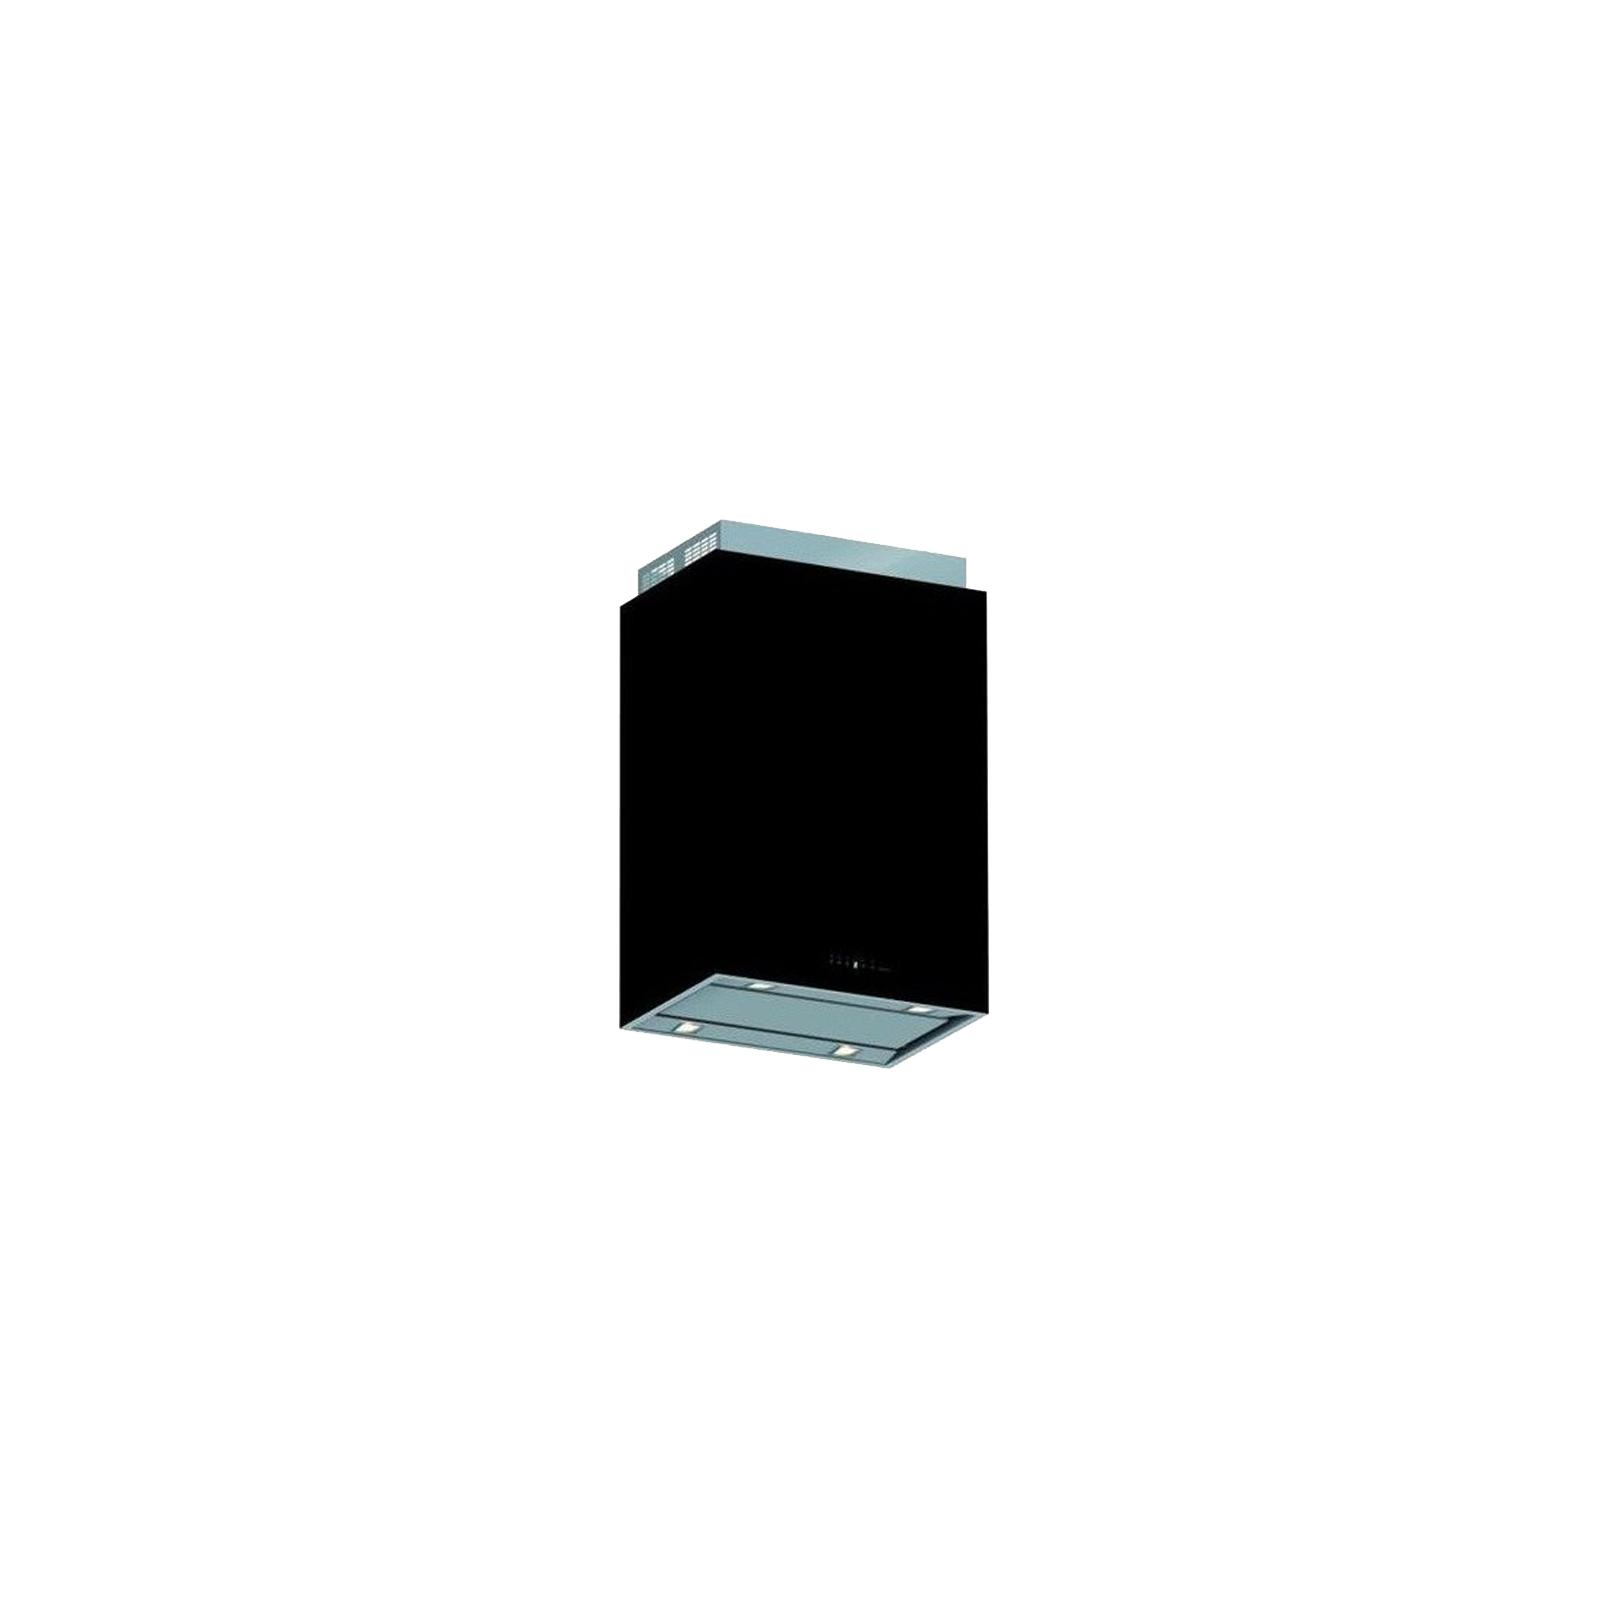 Вытяжка кухонная Falmec LAGUNA ISOLA 900 CM TAUCH